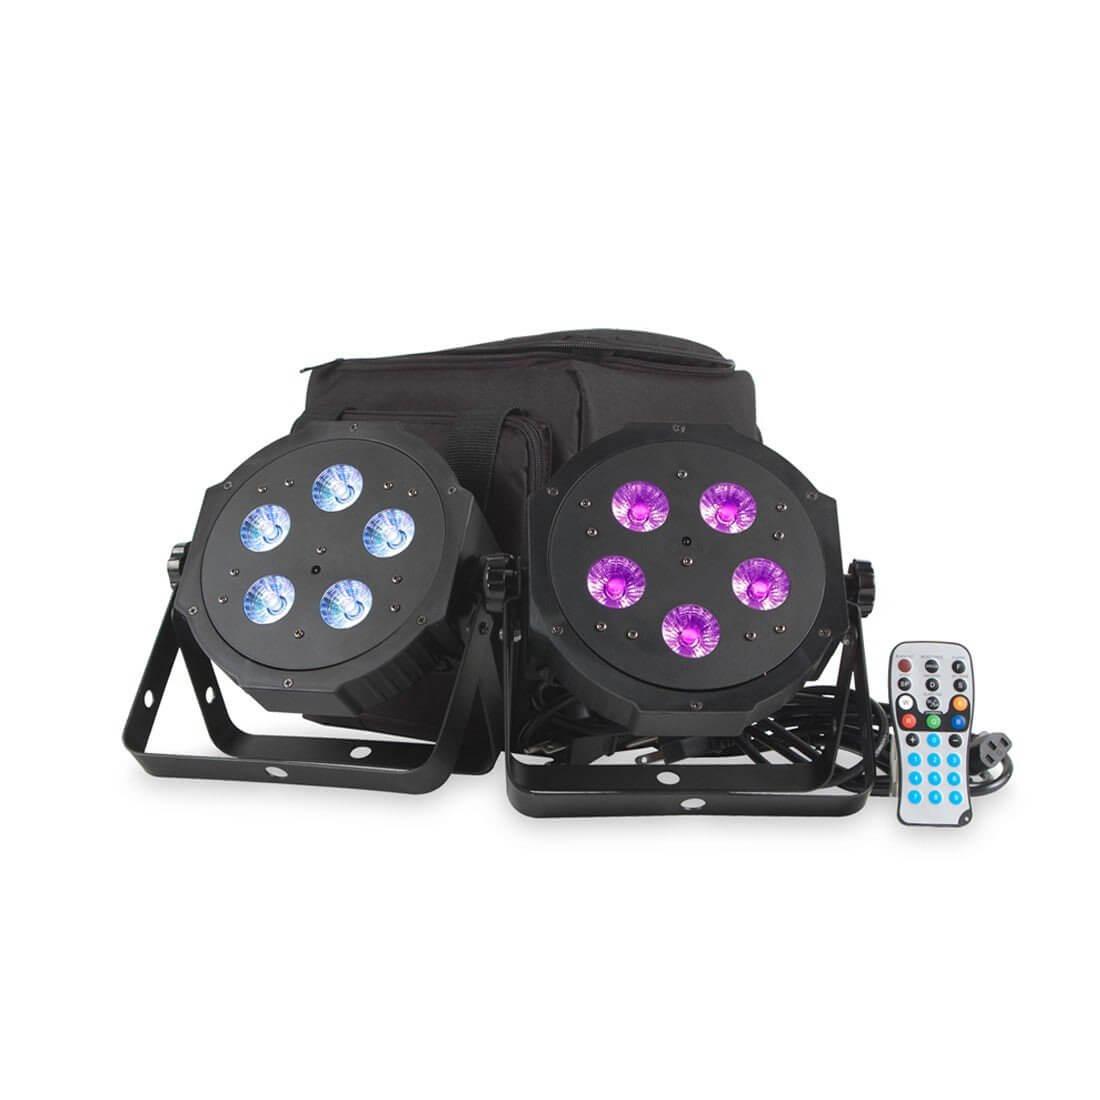 ADJ VPar Pak LED Lighting Kit Uplighter Inc Remote & Case